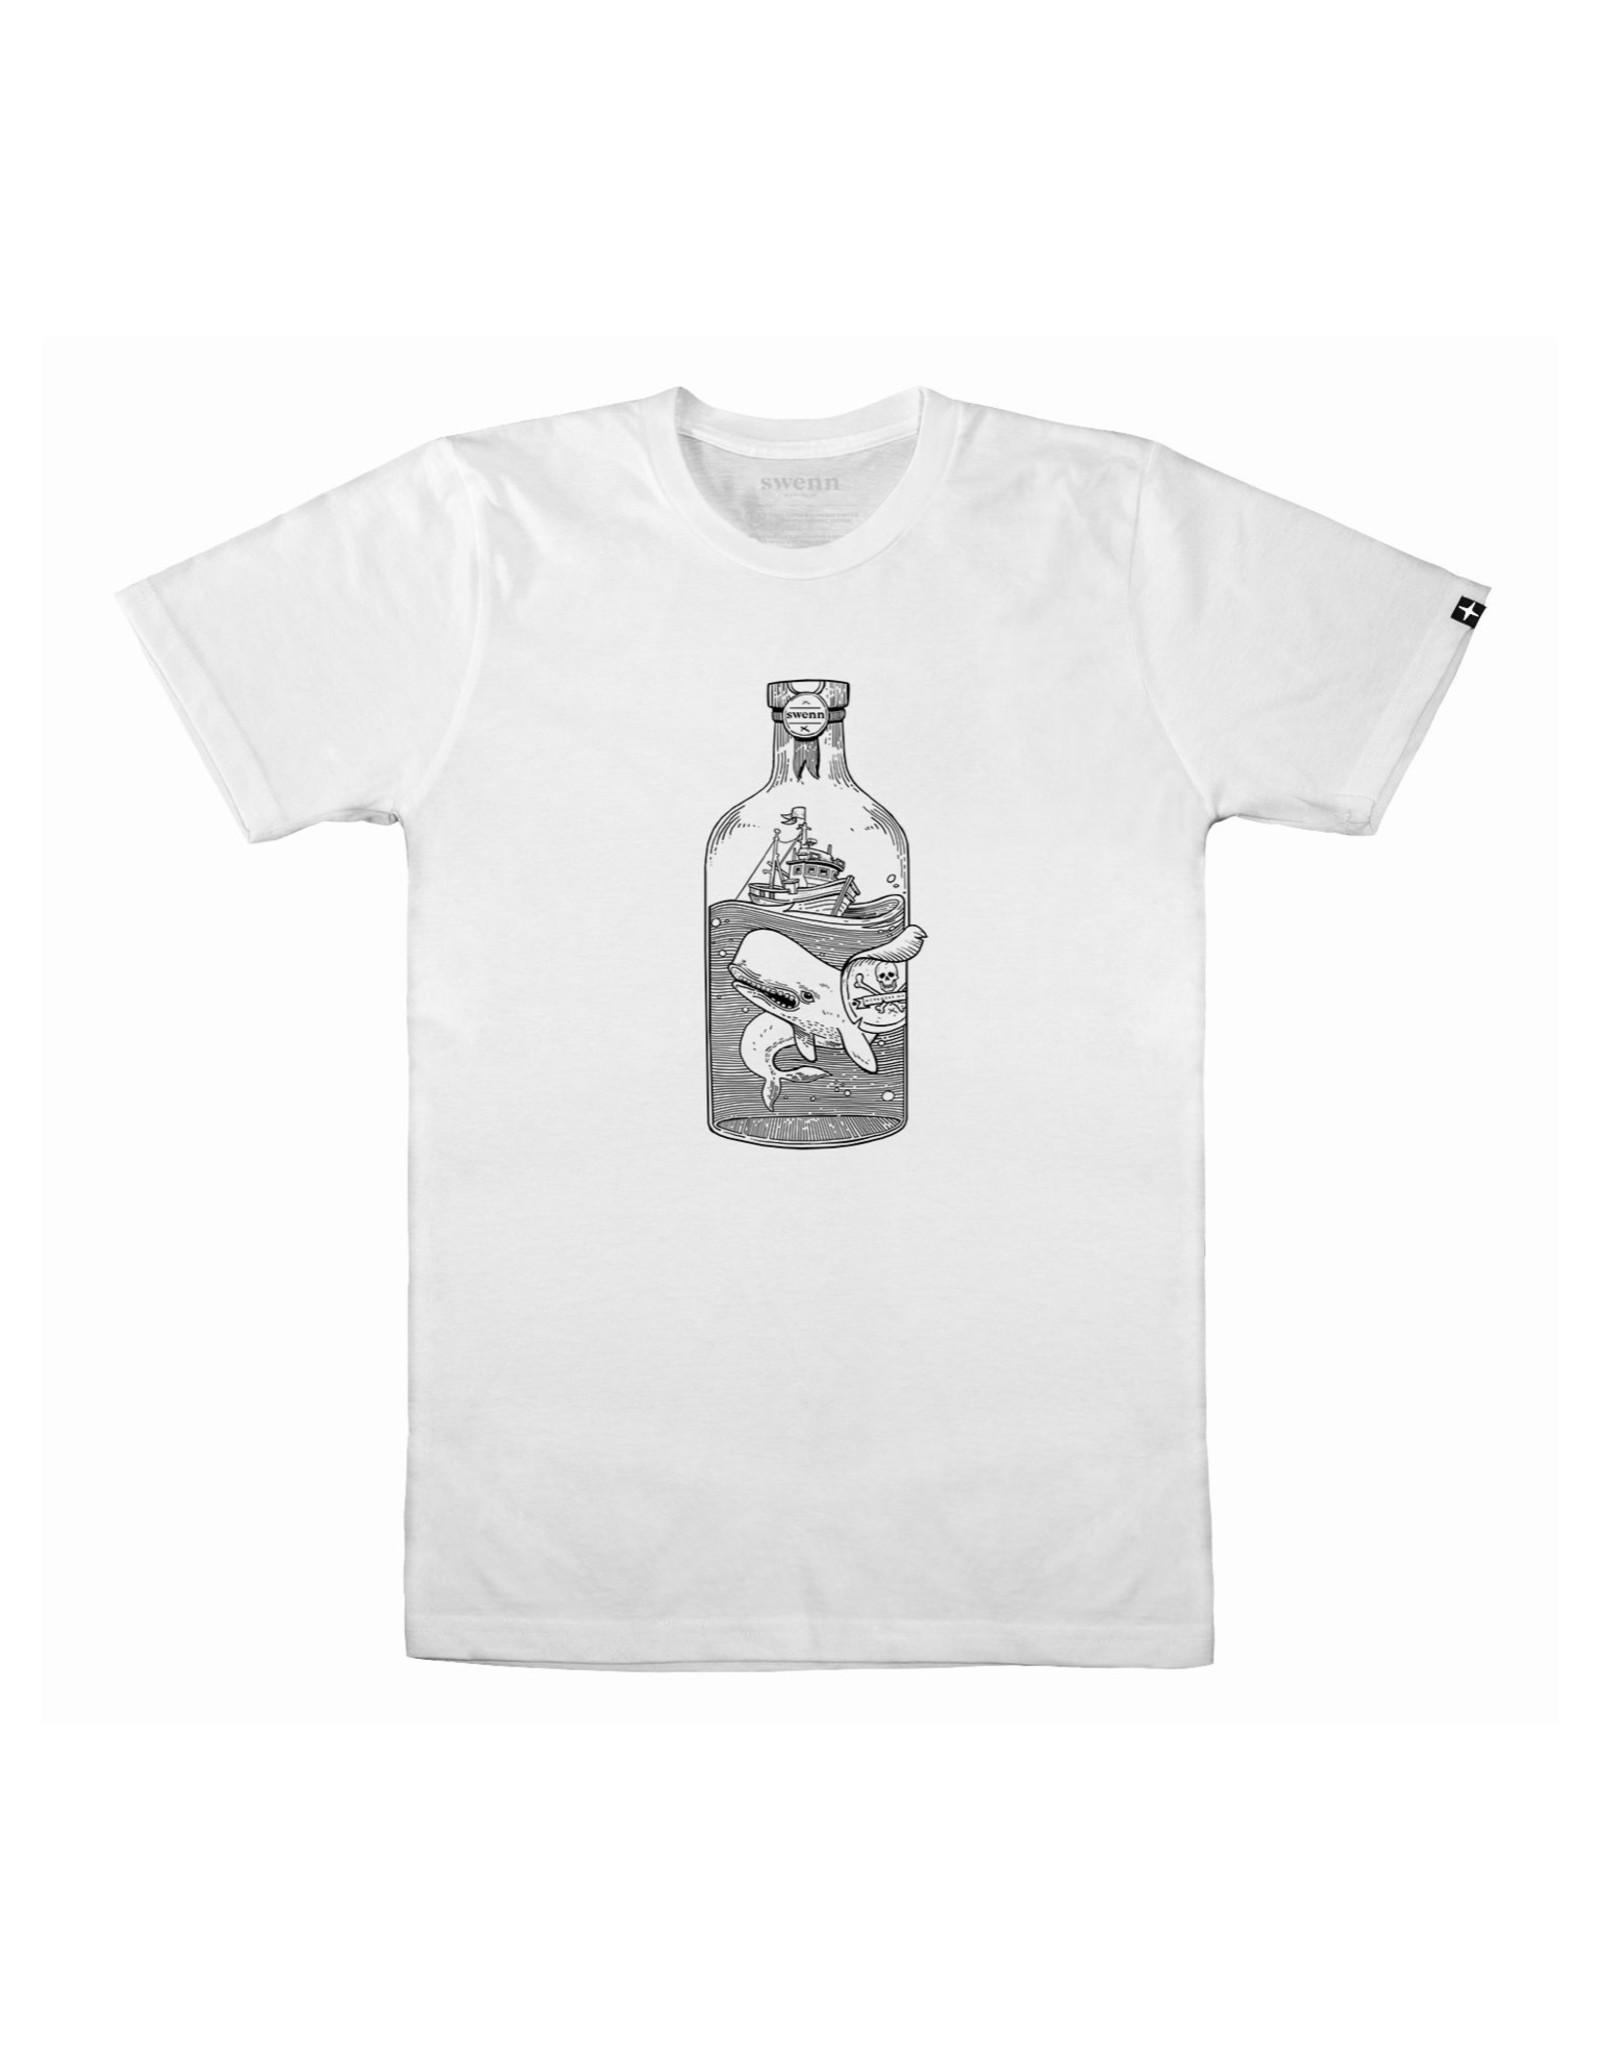 Swenn T-shirt unisexe Baleine - Blanc